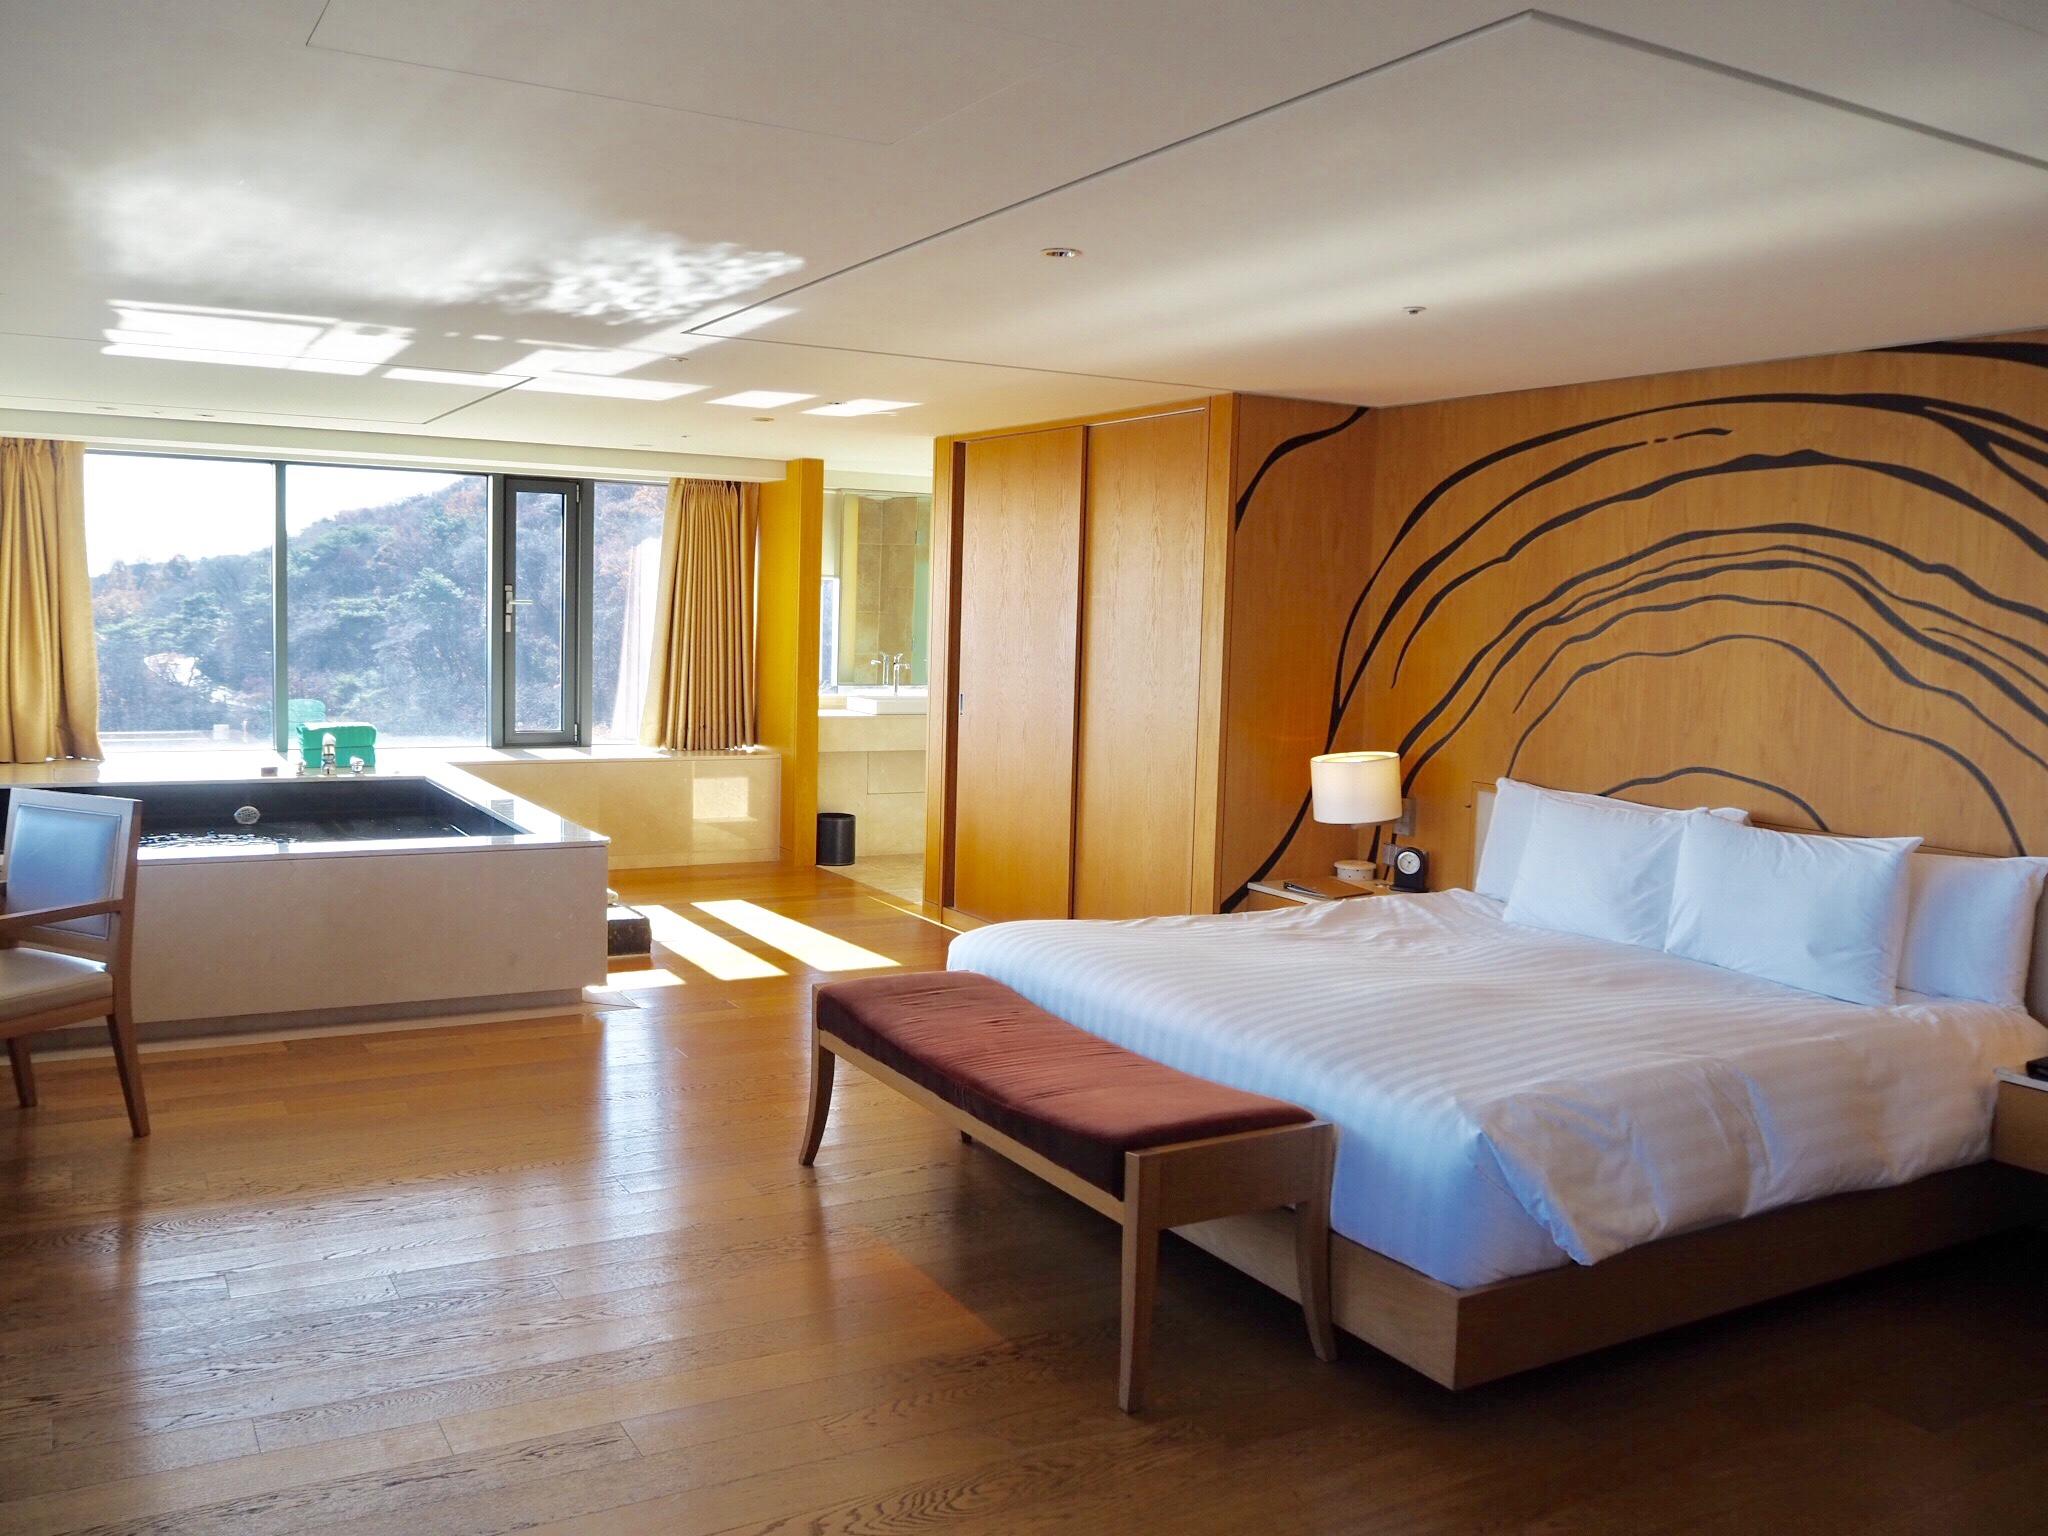 img 7859 - Banyan Tree Club & Spa Seoul - リピーターにお勧めしたい韓国ソウルのちょっと贅沢なステイ先